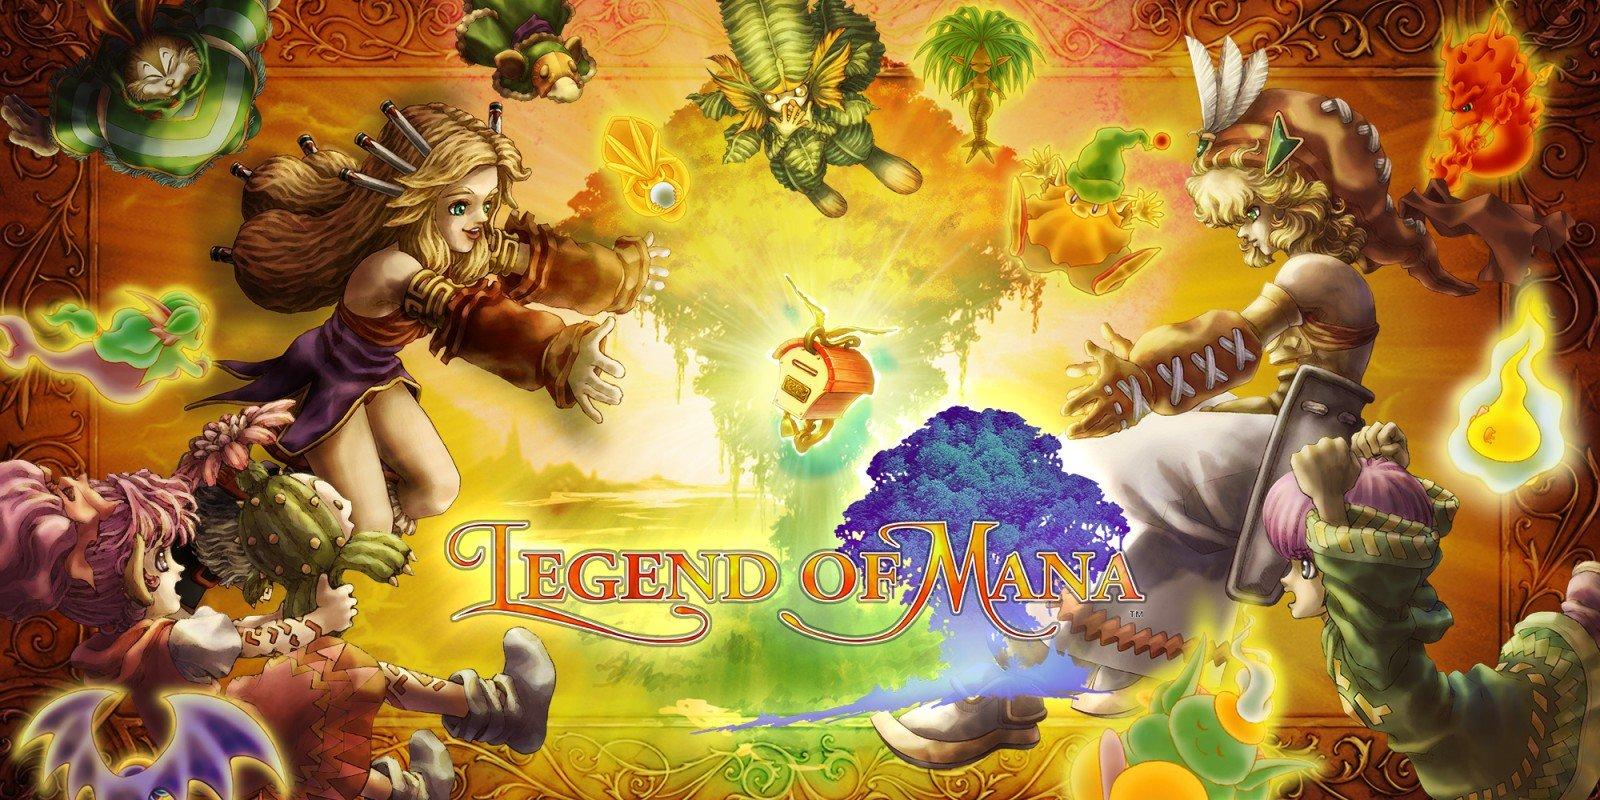 Legend of Mana Square Enix